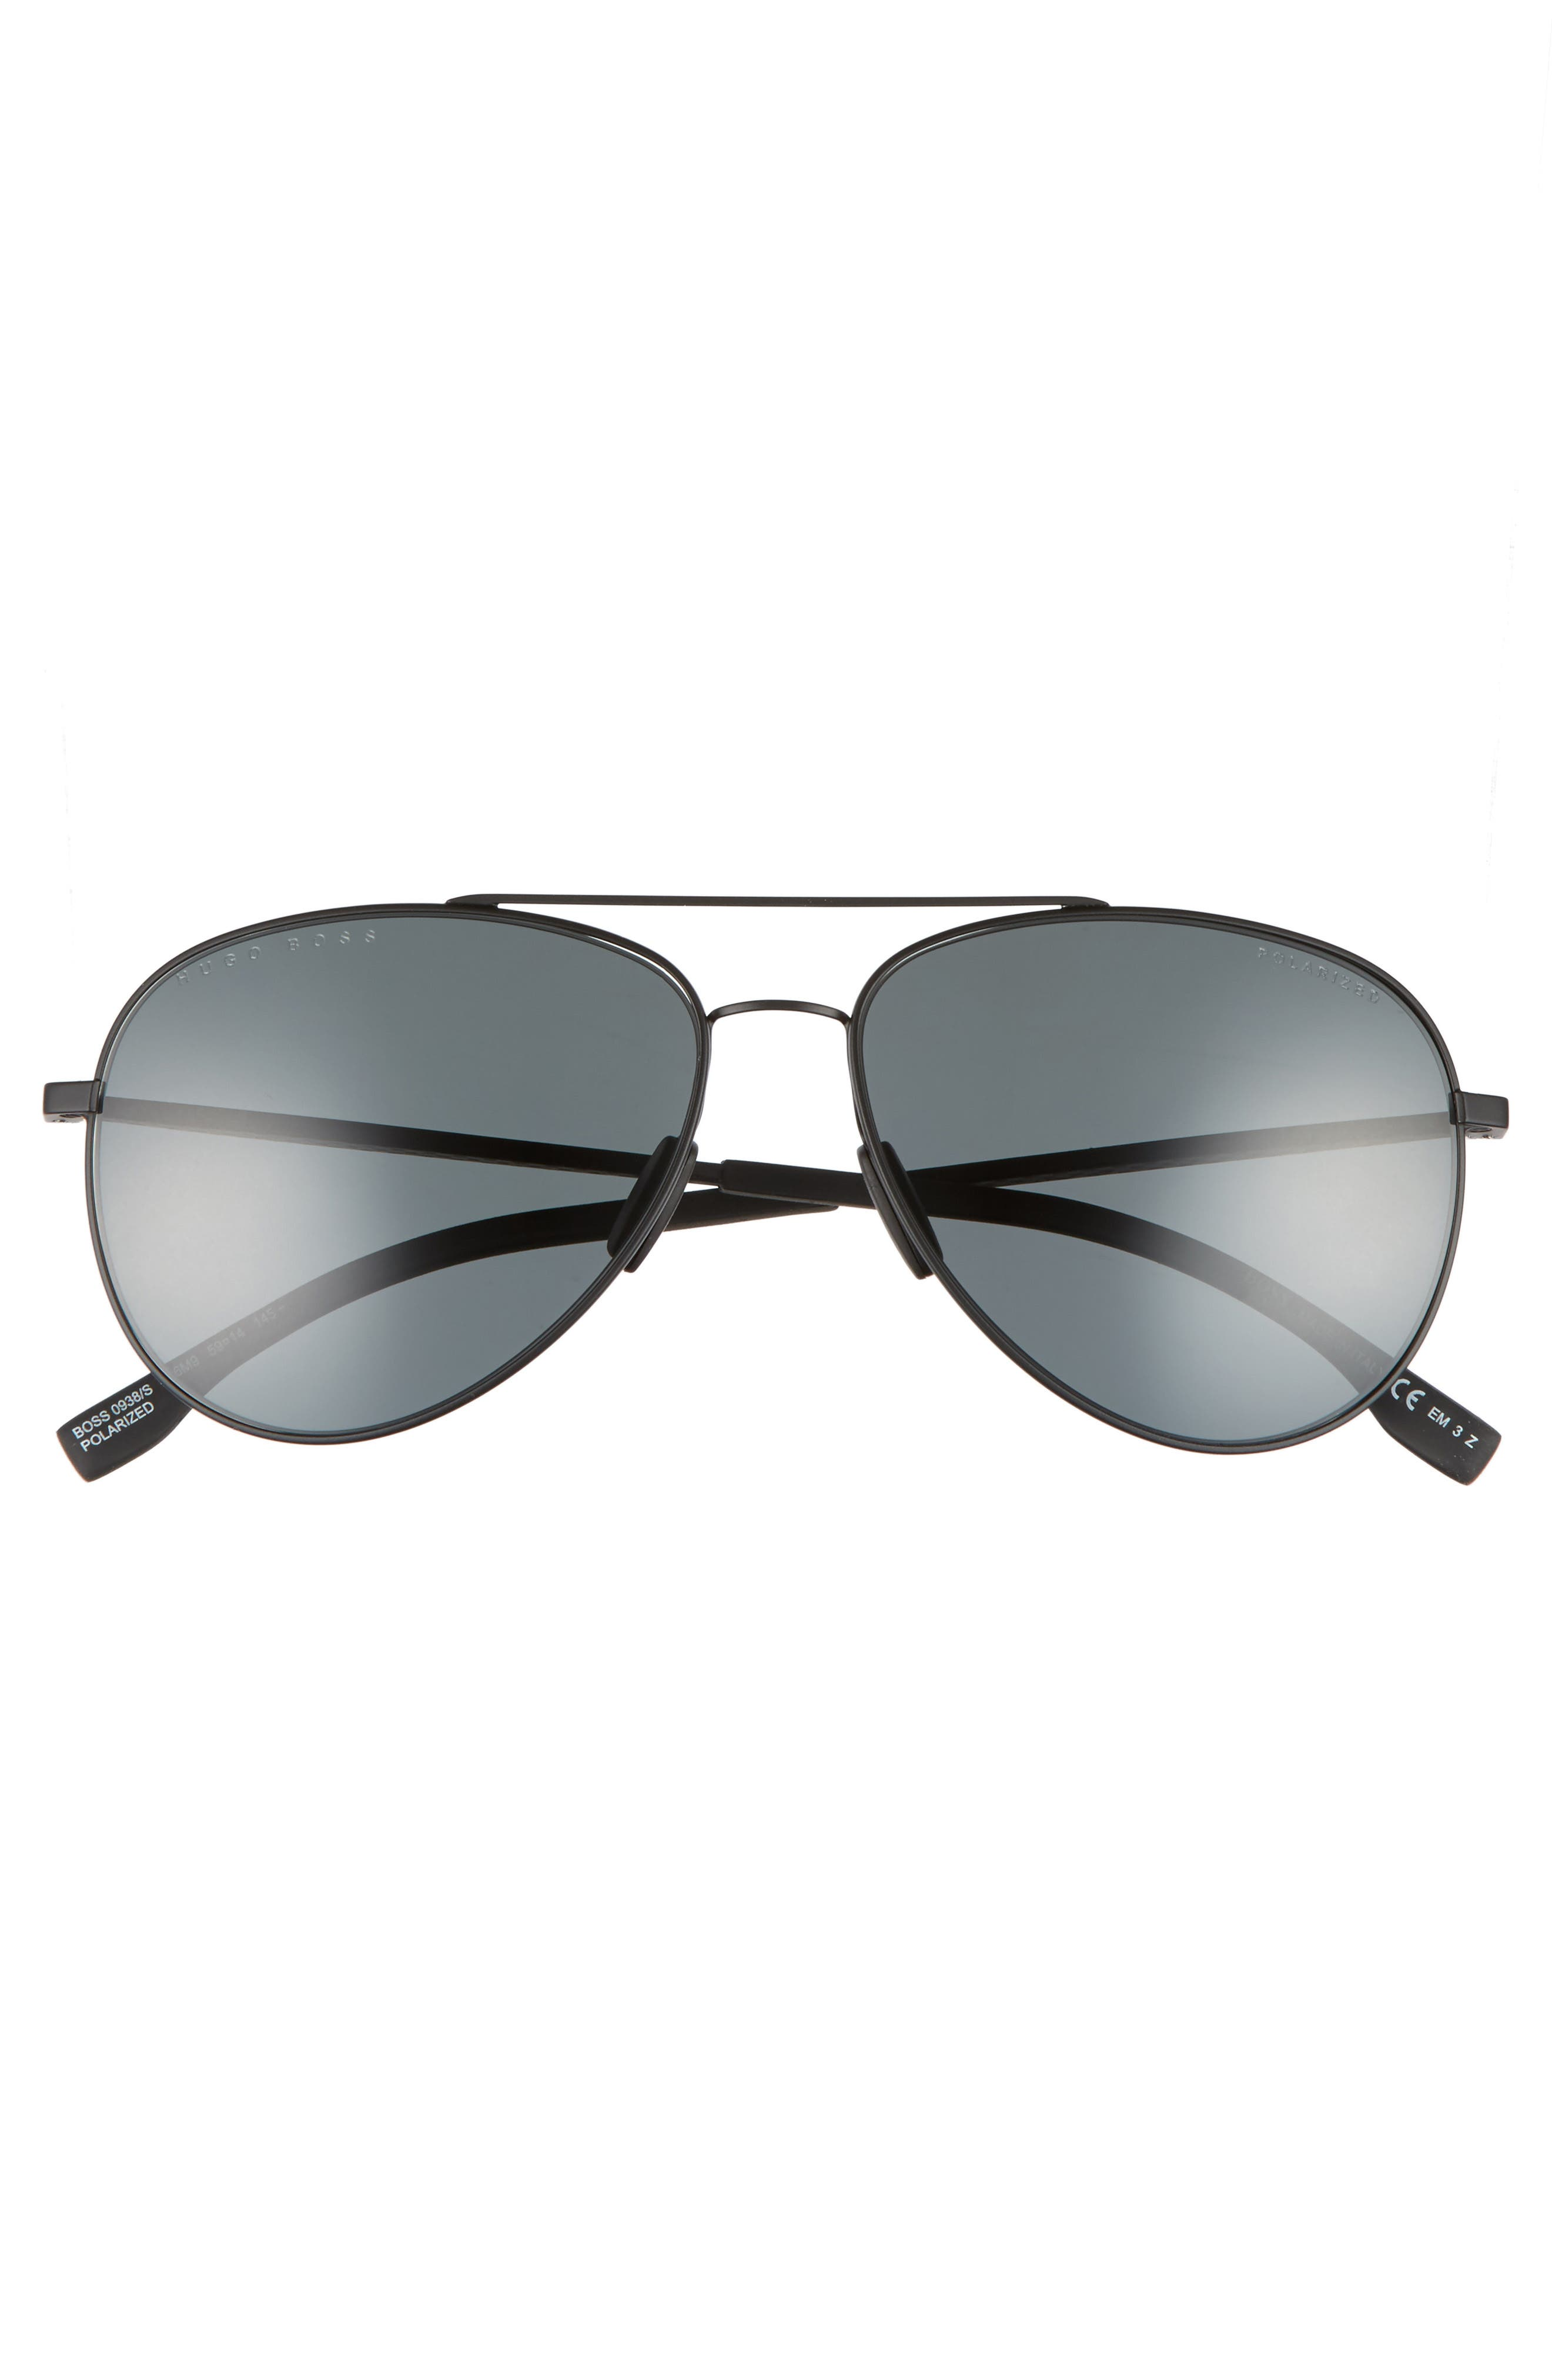 59mm Aviator Sunglasses,                             Alternate thumbnail 2, color,                             003